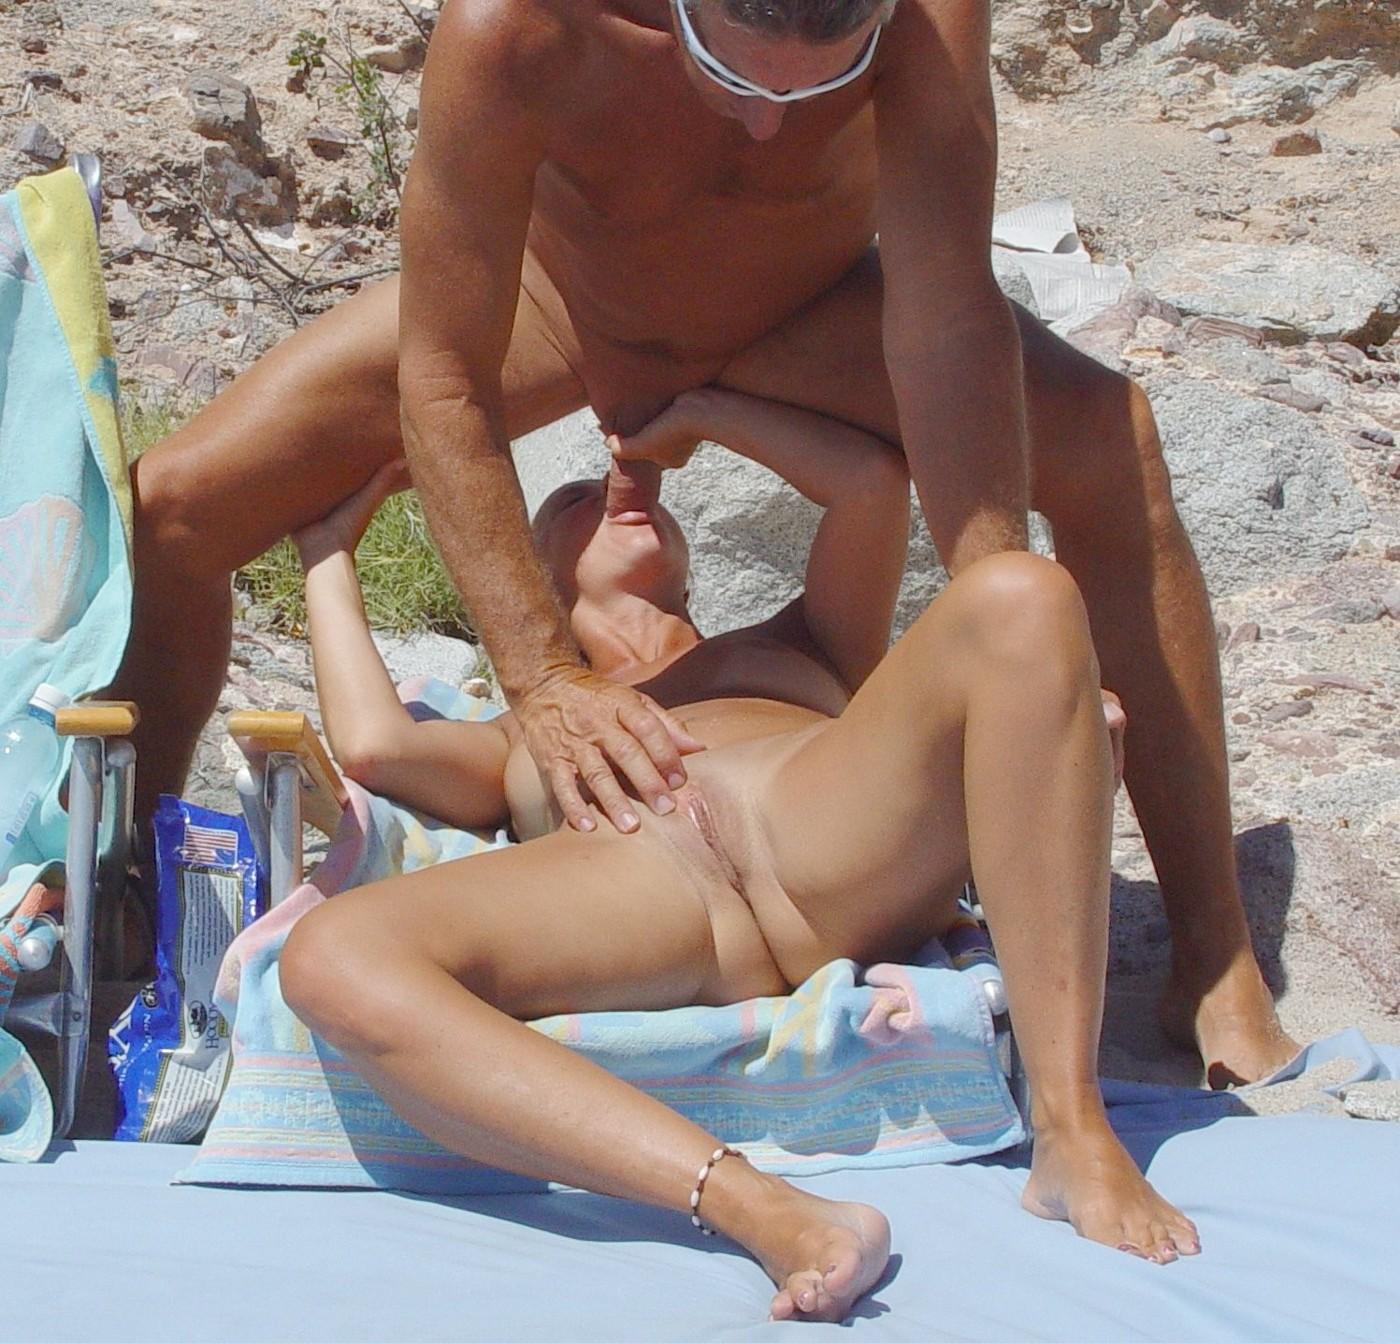 genuine amateur sex movies outdoor